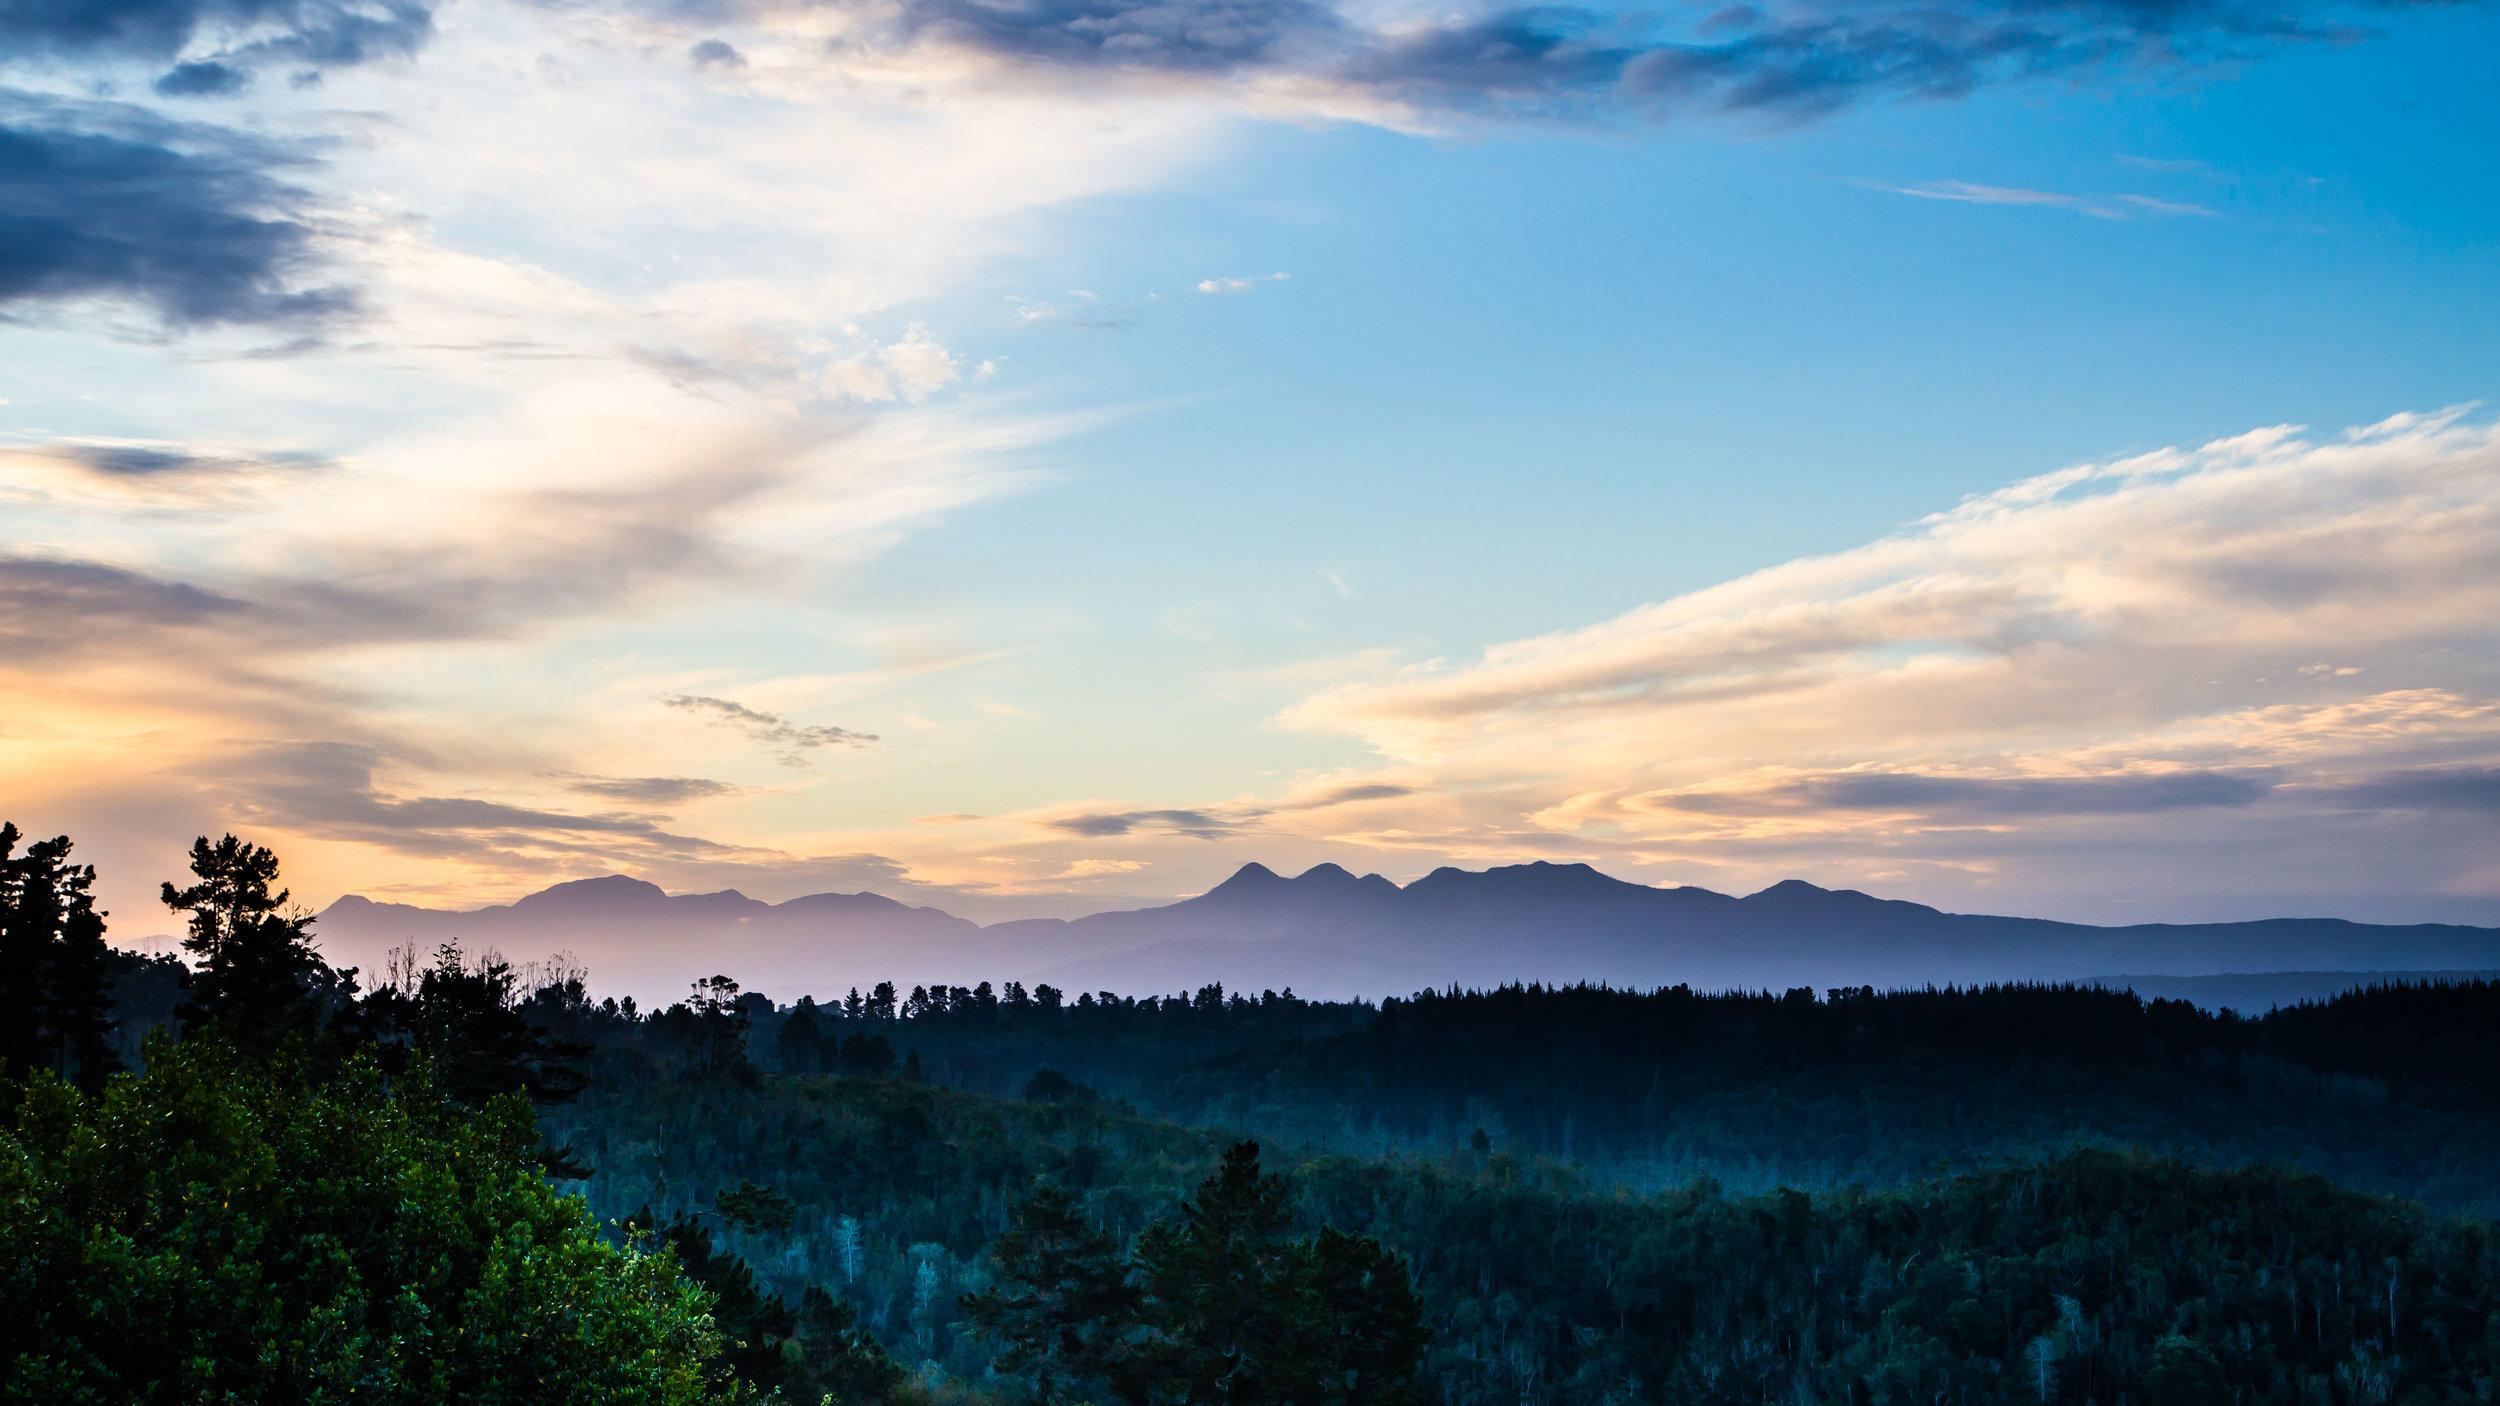 knysna-forest-western-cape-tyson-jopson-1.jpg